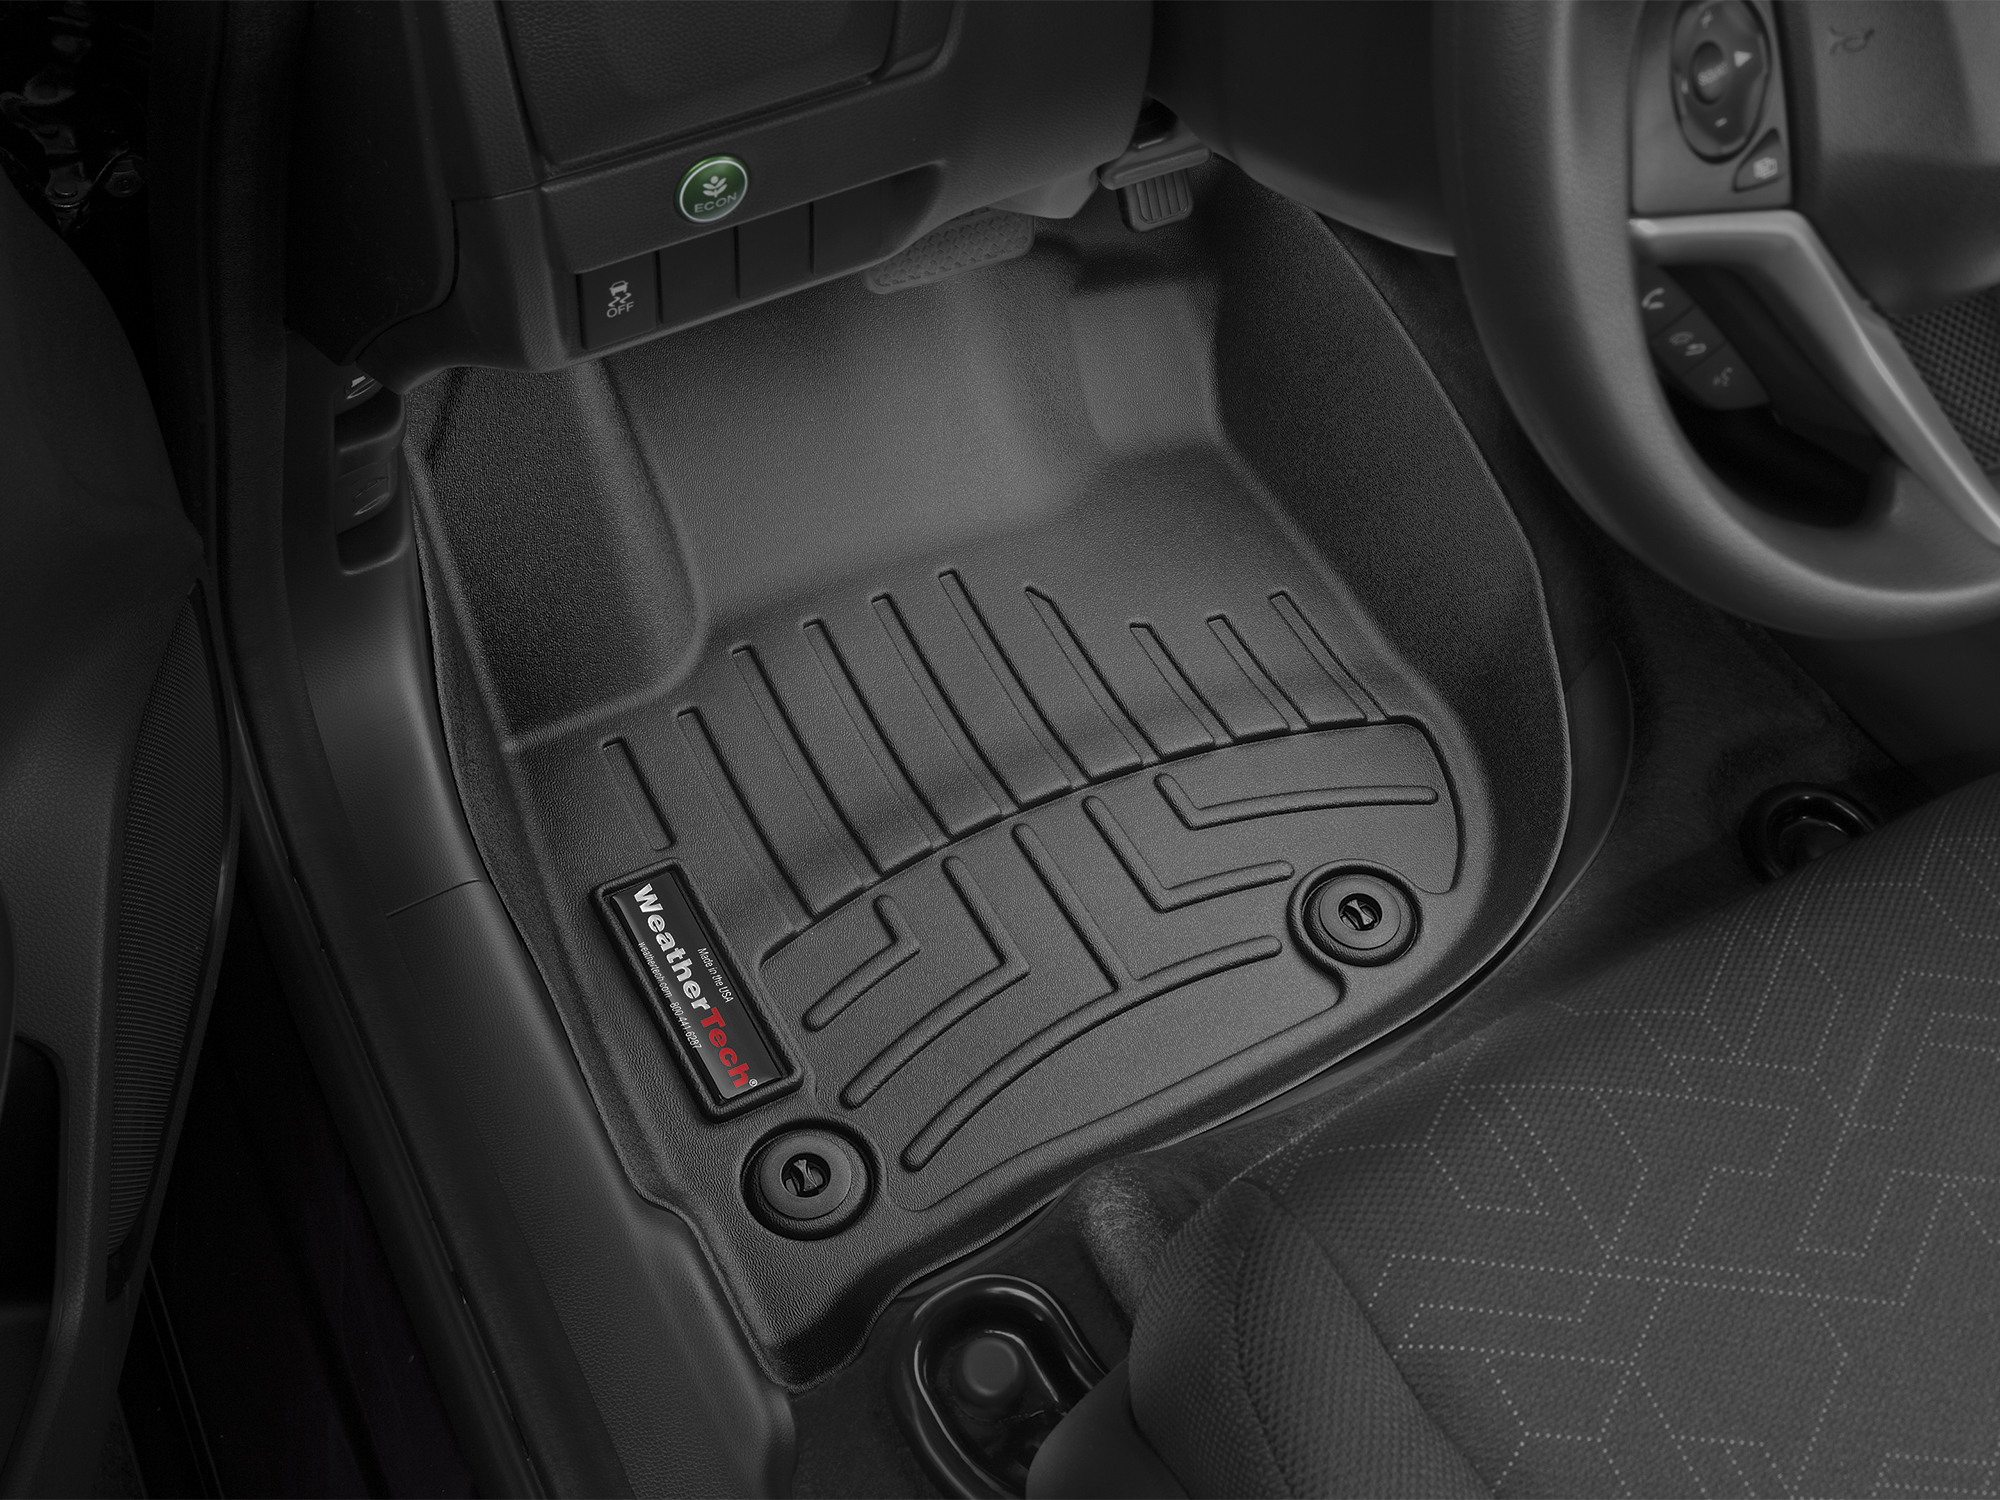 2018 Honda Fit | AVM HD Floor Mats   Heavy Duty Flexible Trim To Fit Mats |  WeatherTech